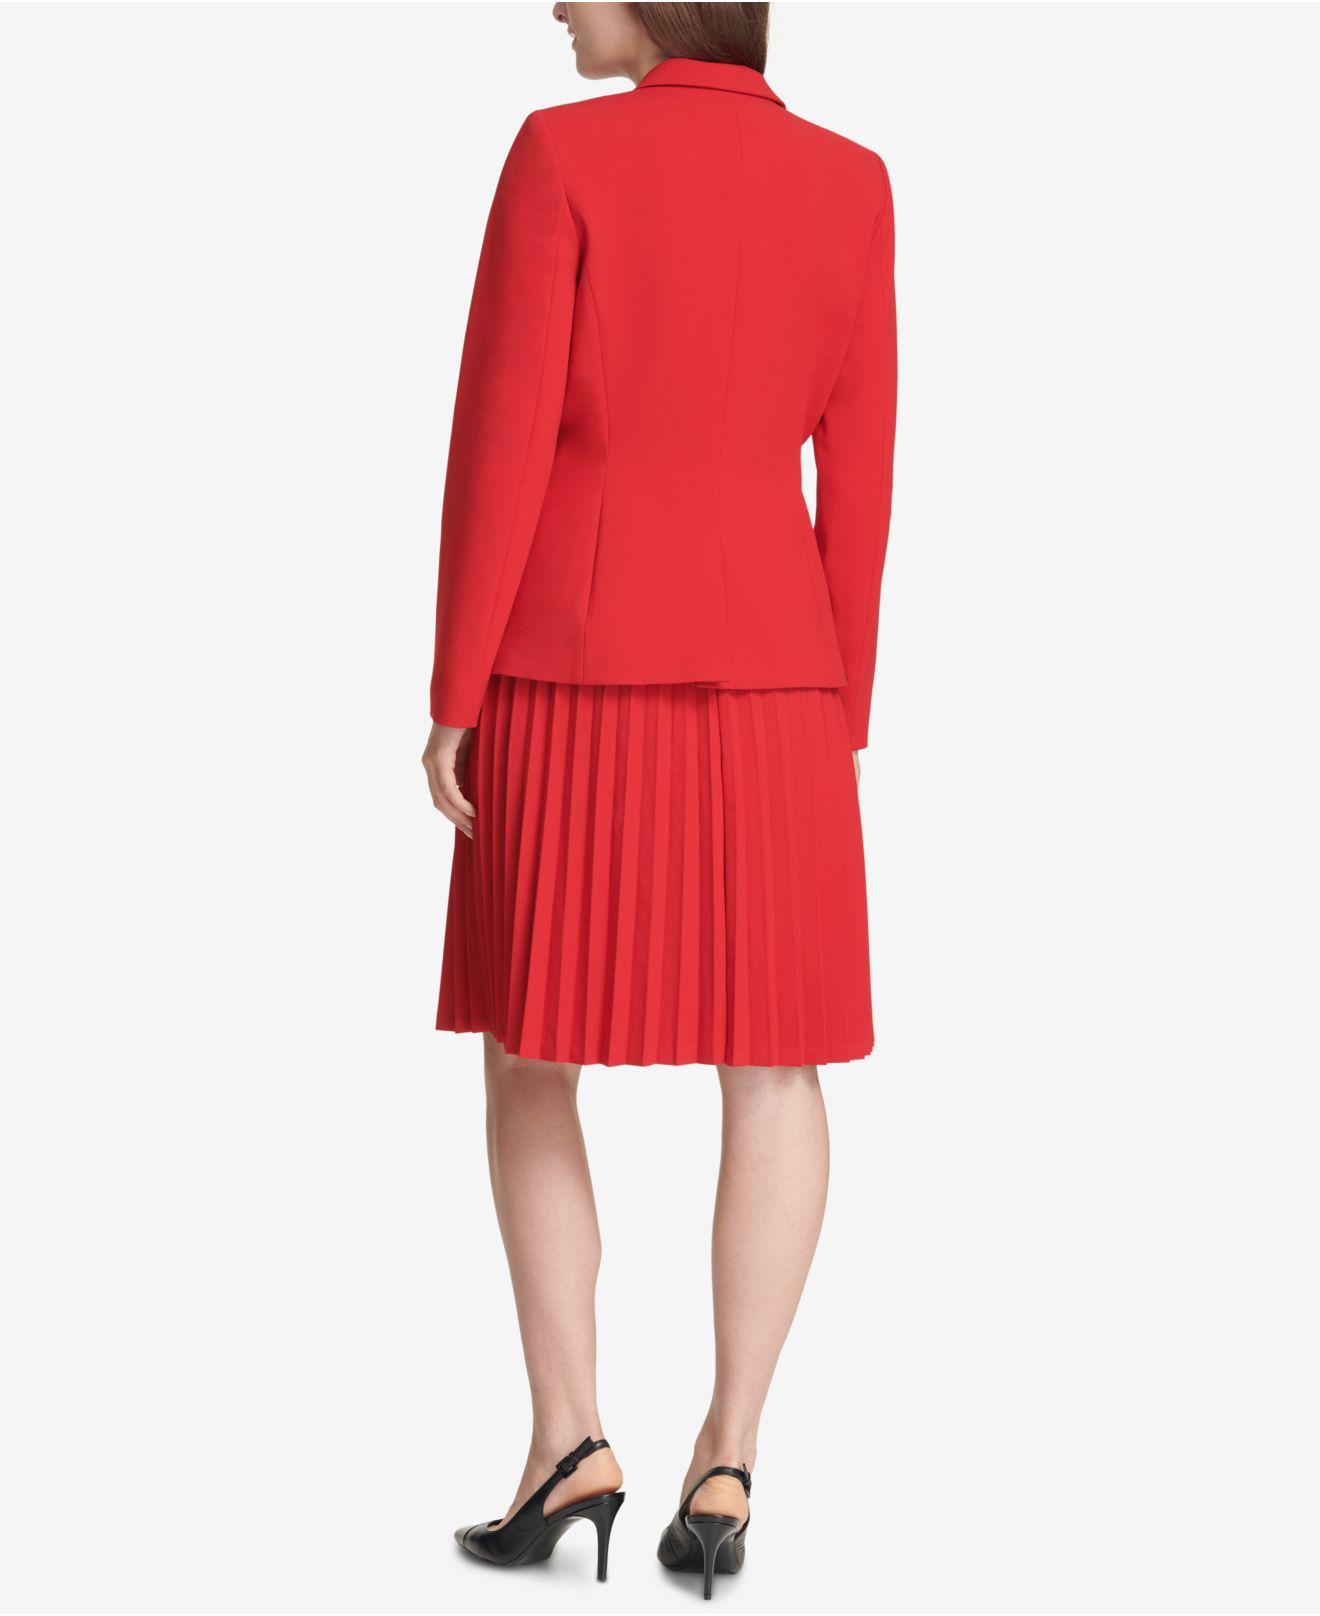 6a76f4c9b43249 Lyst - Calvin Klein One-button Notch-collar Jacket in Red